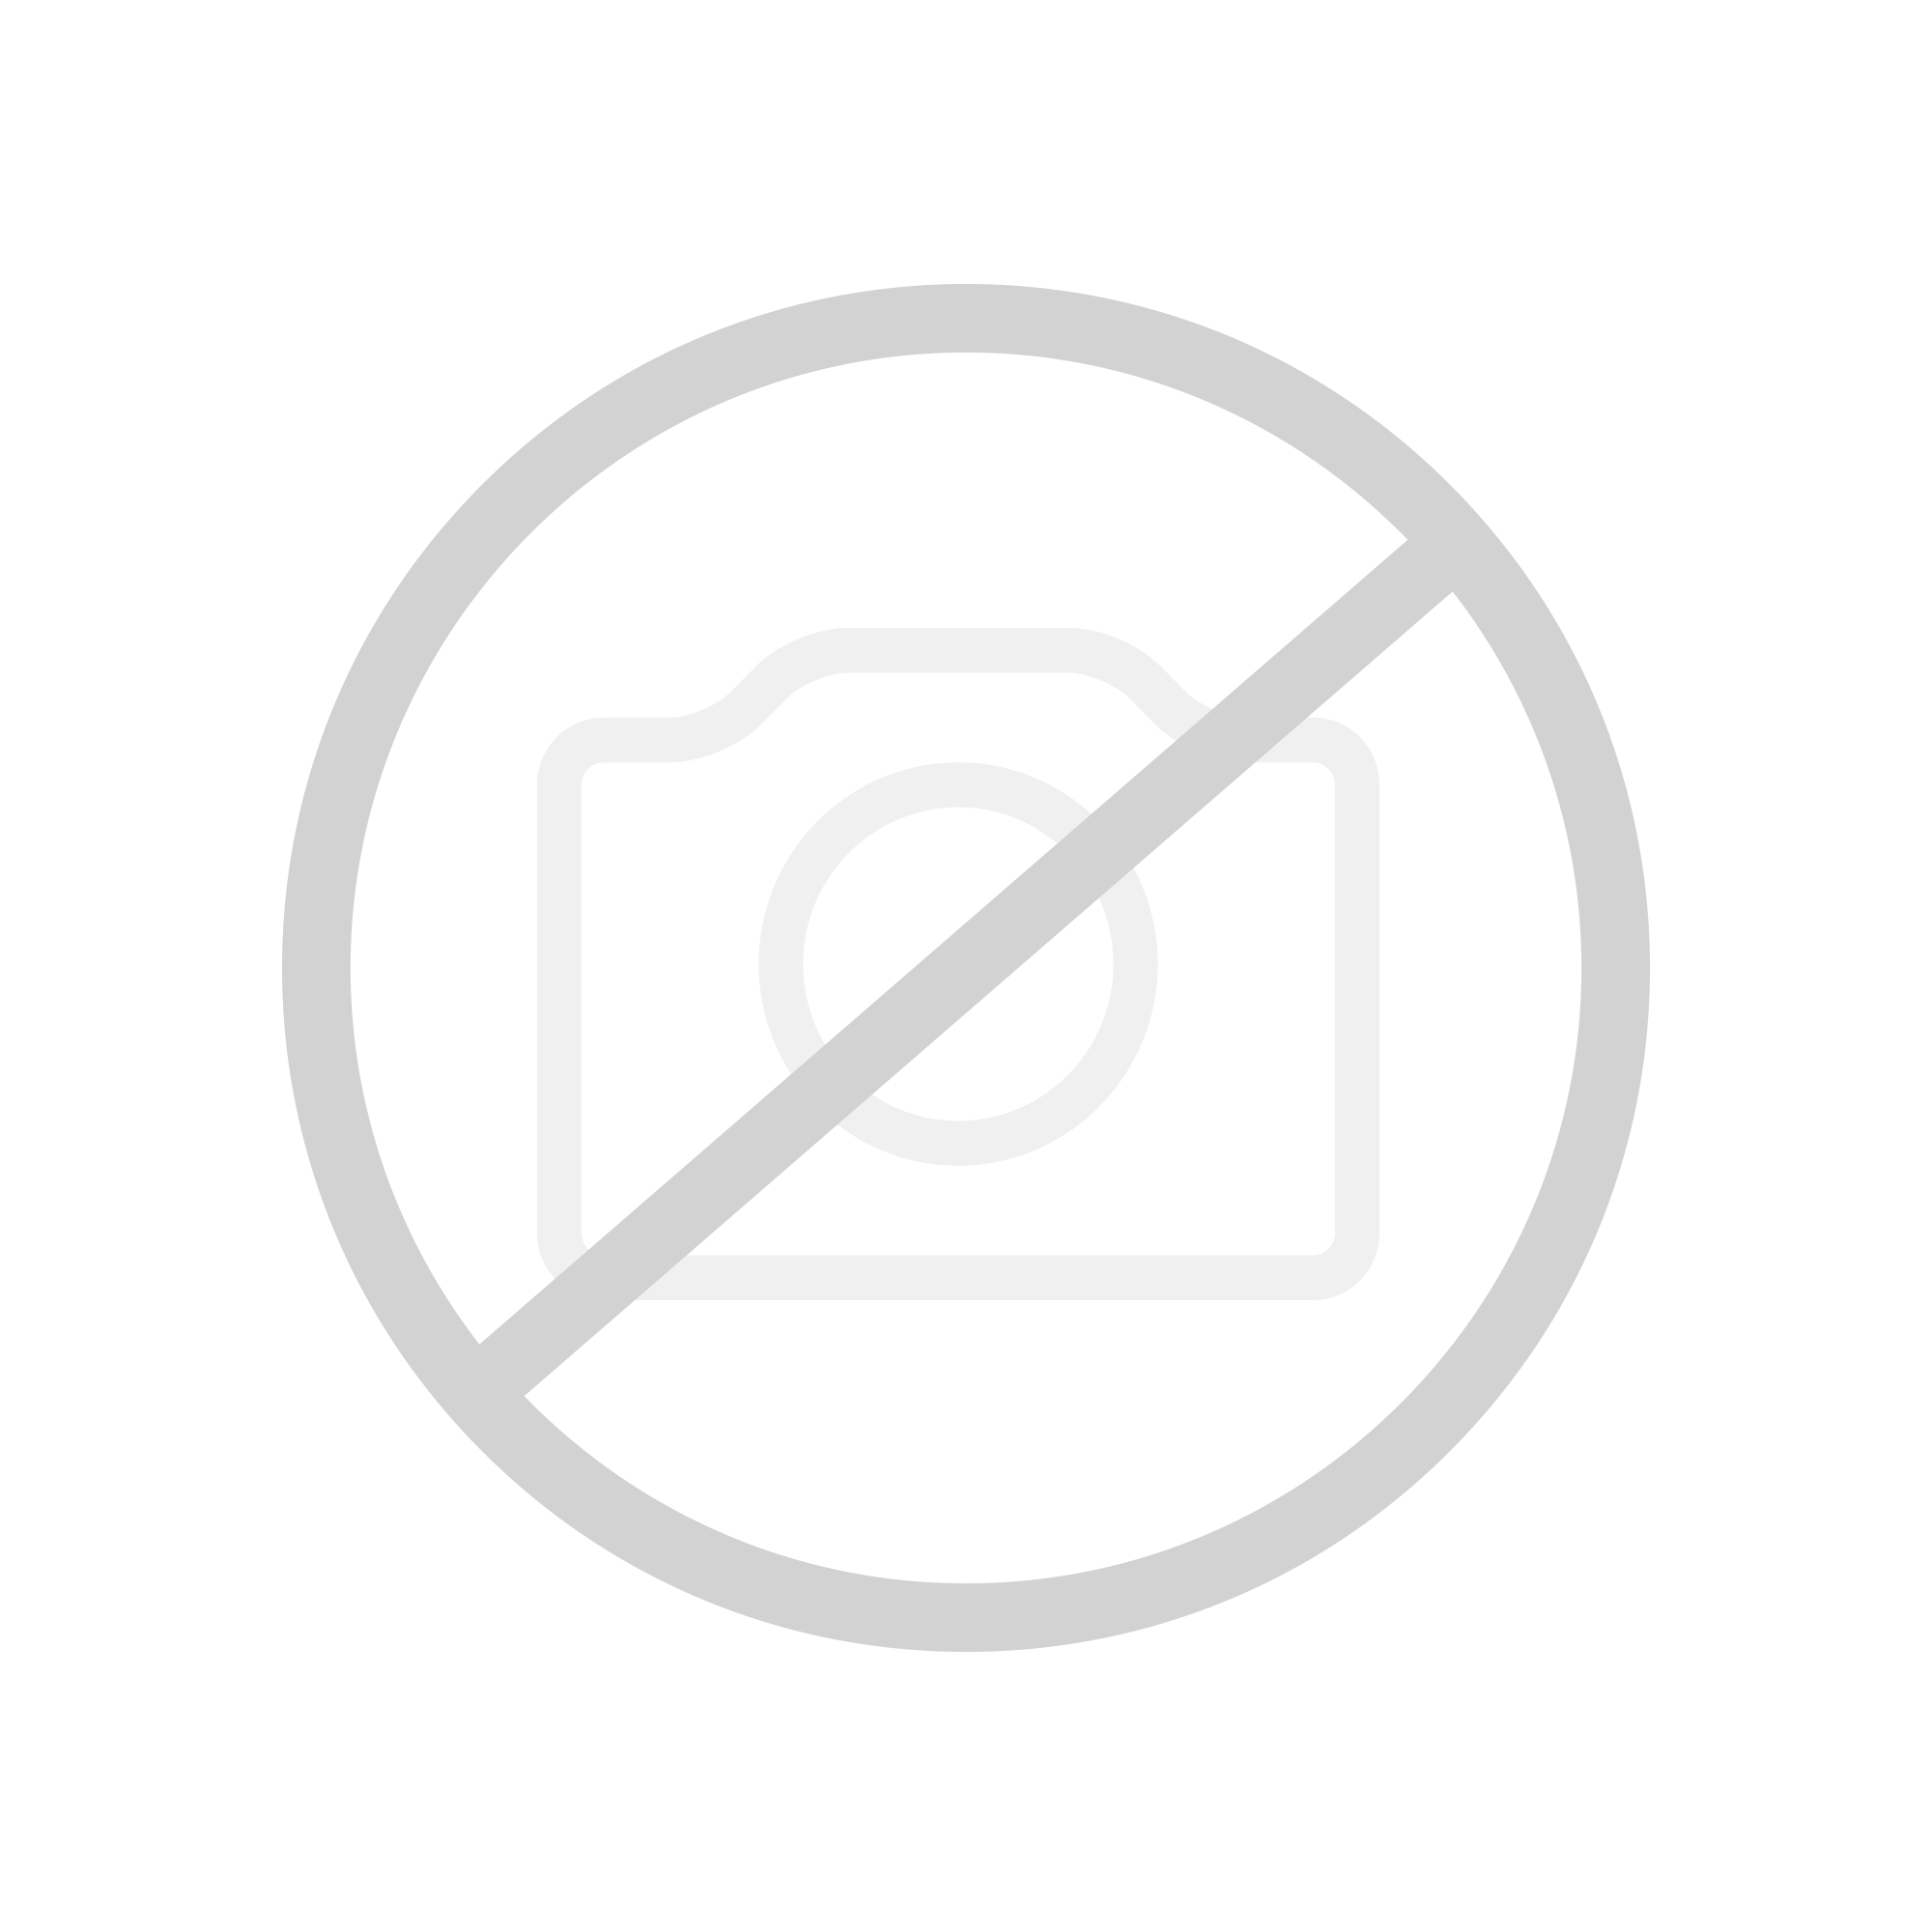 regendusche kaufen » ratgeber & kaufberatung bei reuter - Regendusche Unterputz